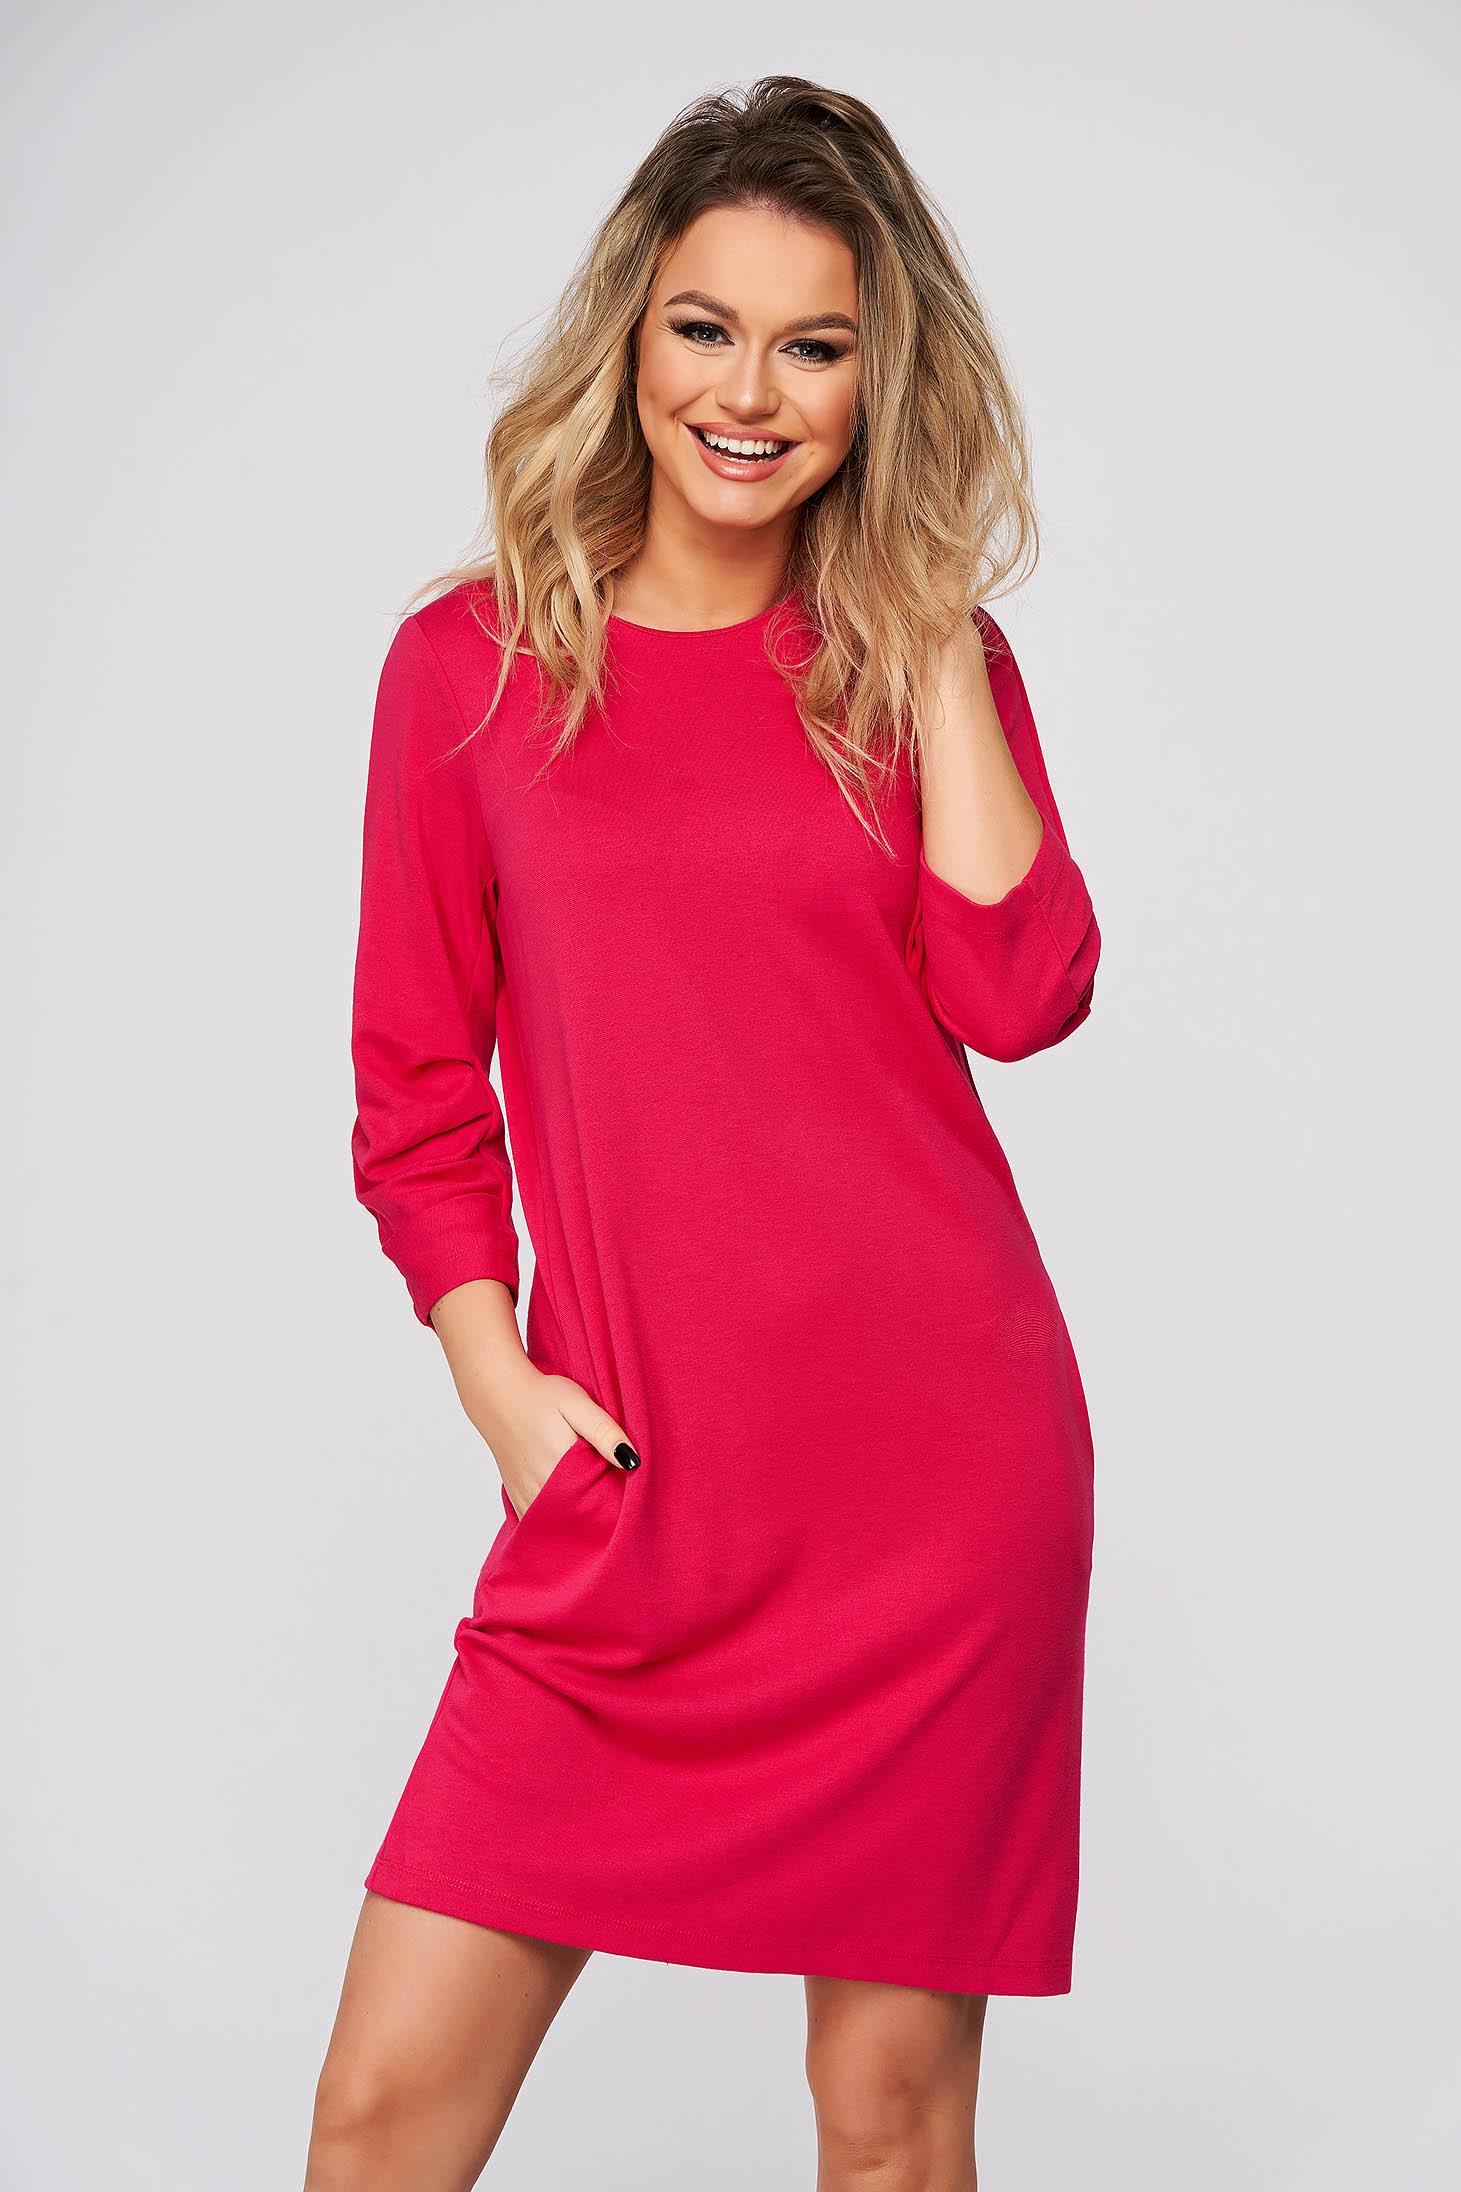 Pink dress short cut casual slightly elastic fabric